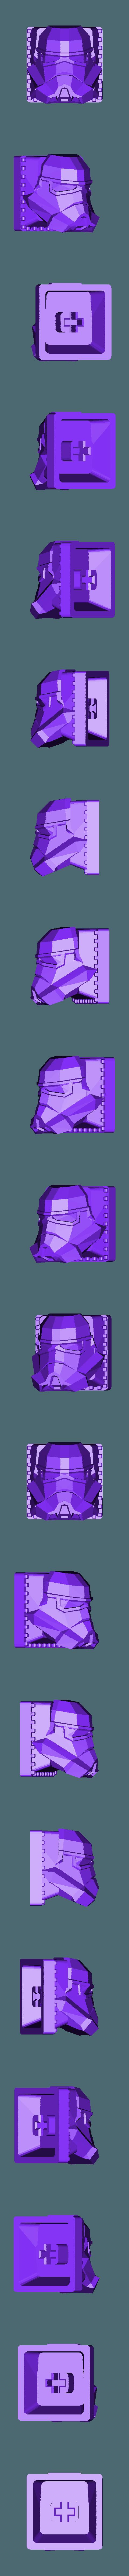 StarWars_MX_Cherry_KeyCaps.stl Download free STL file Star Wars MX Cherry Keycaps • 3D printing object, FedorSosnin